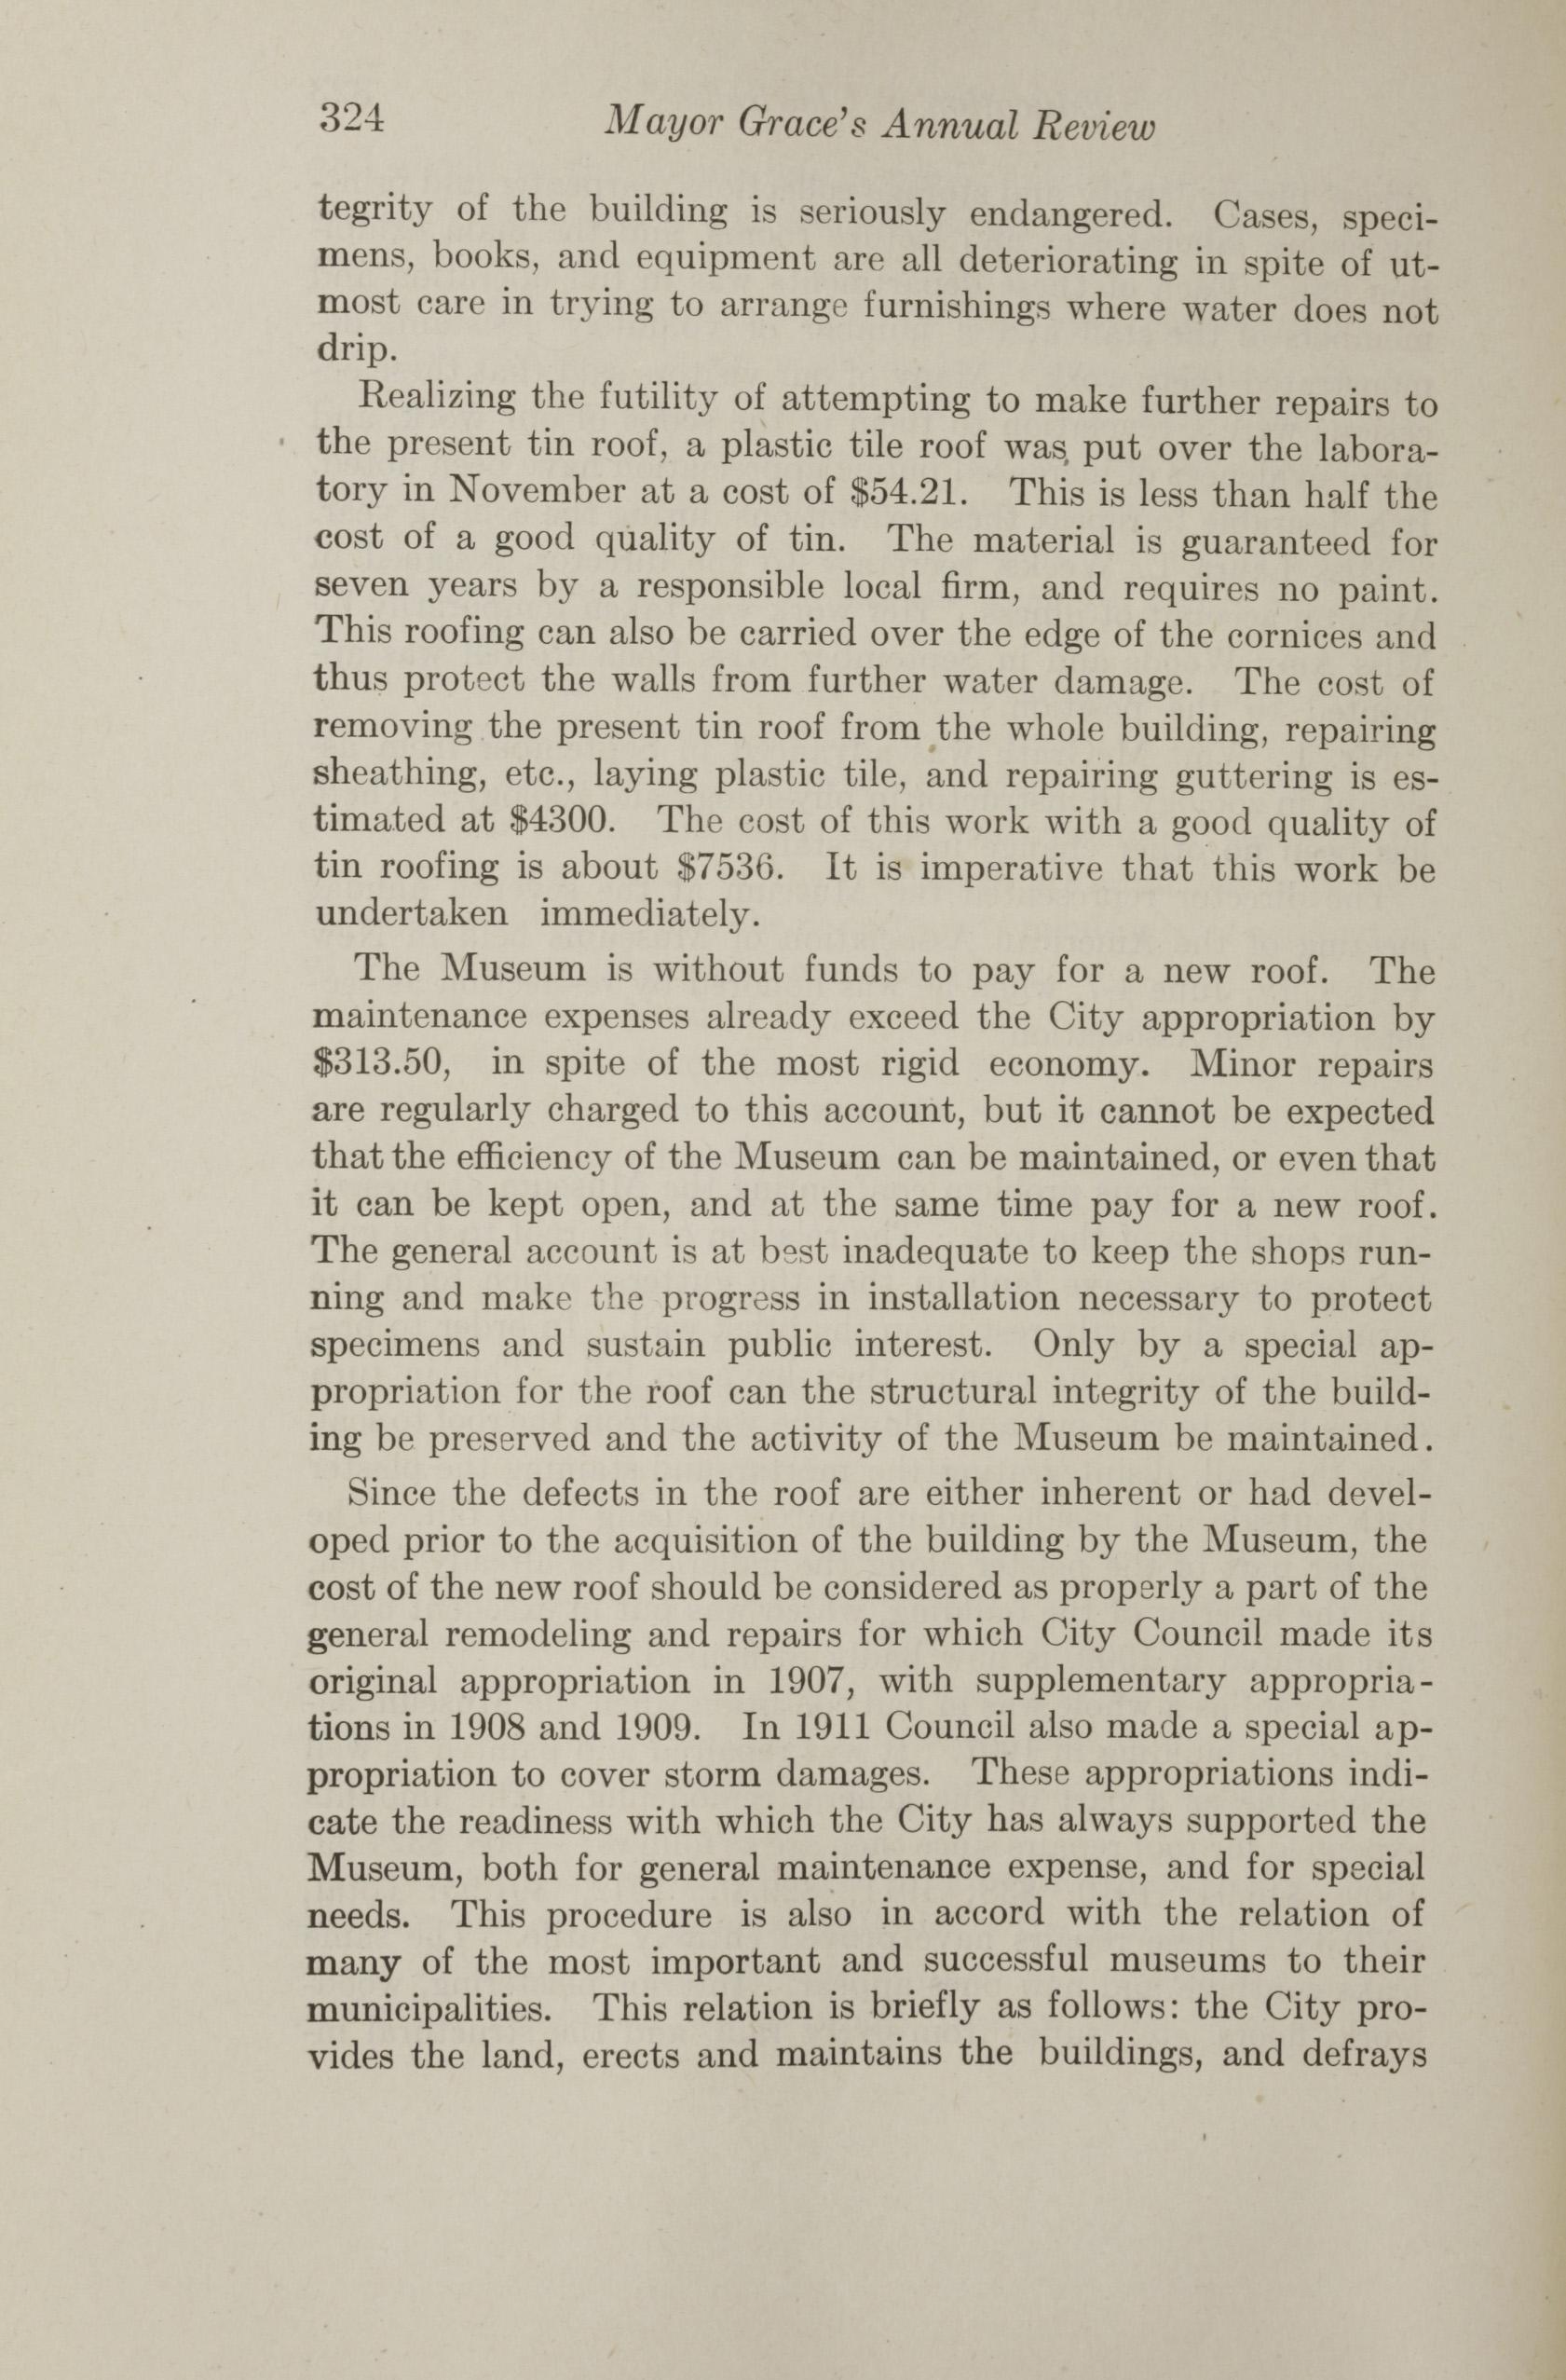 Charleston Yearbook, 1912, page 324